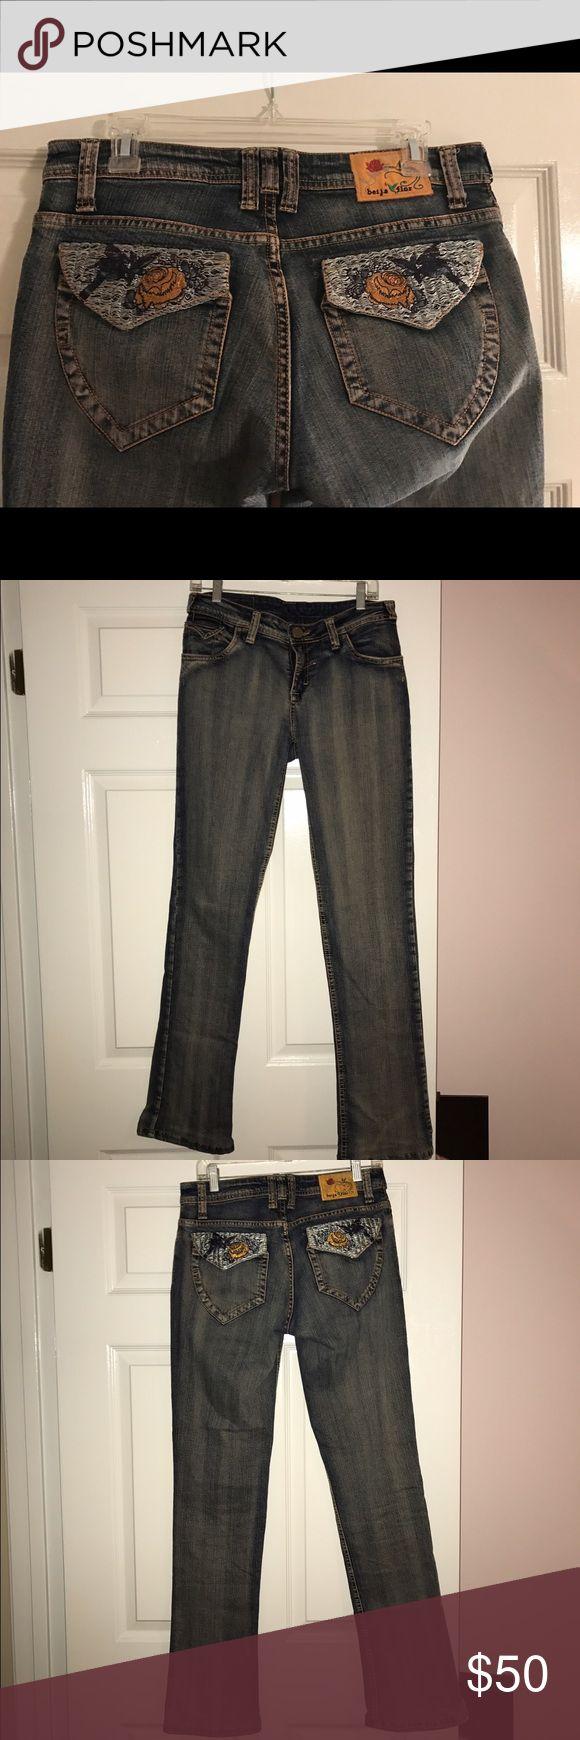 Beija Flor jeans Great fitting Beija Flor 5 pocket jeans. Embroidered back pockets. Slight flare leg. Beija Flor Jeans Straight Leg